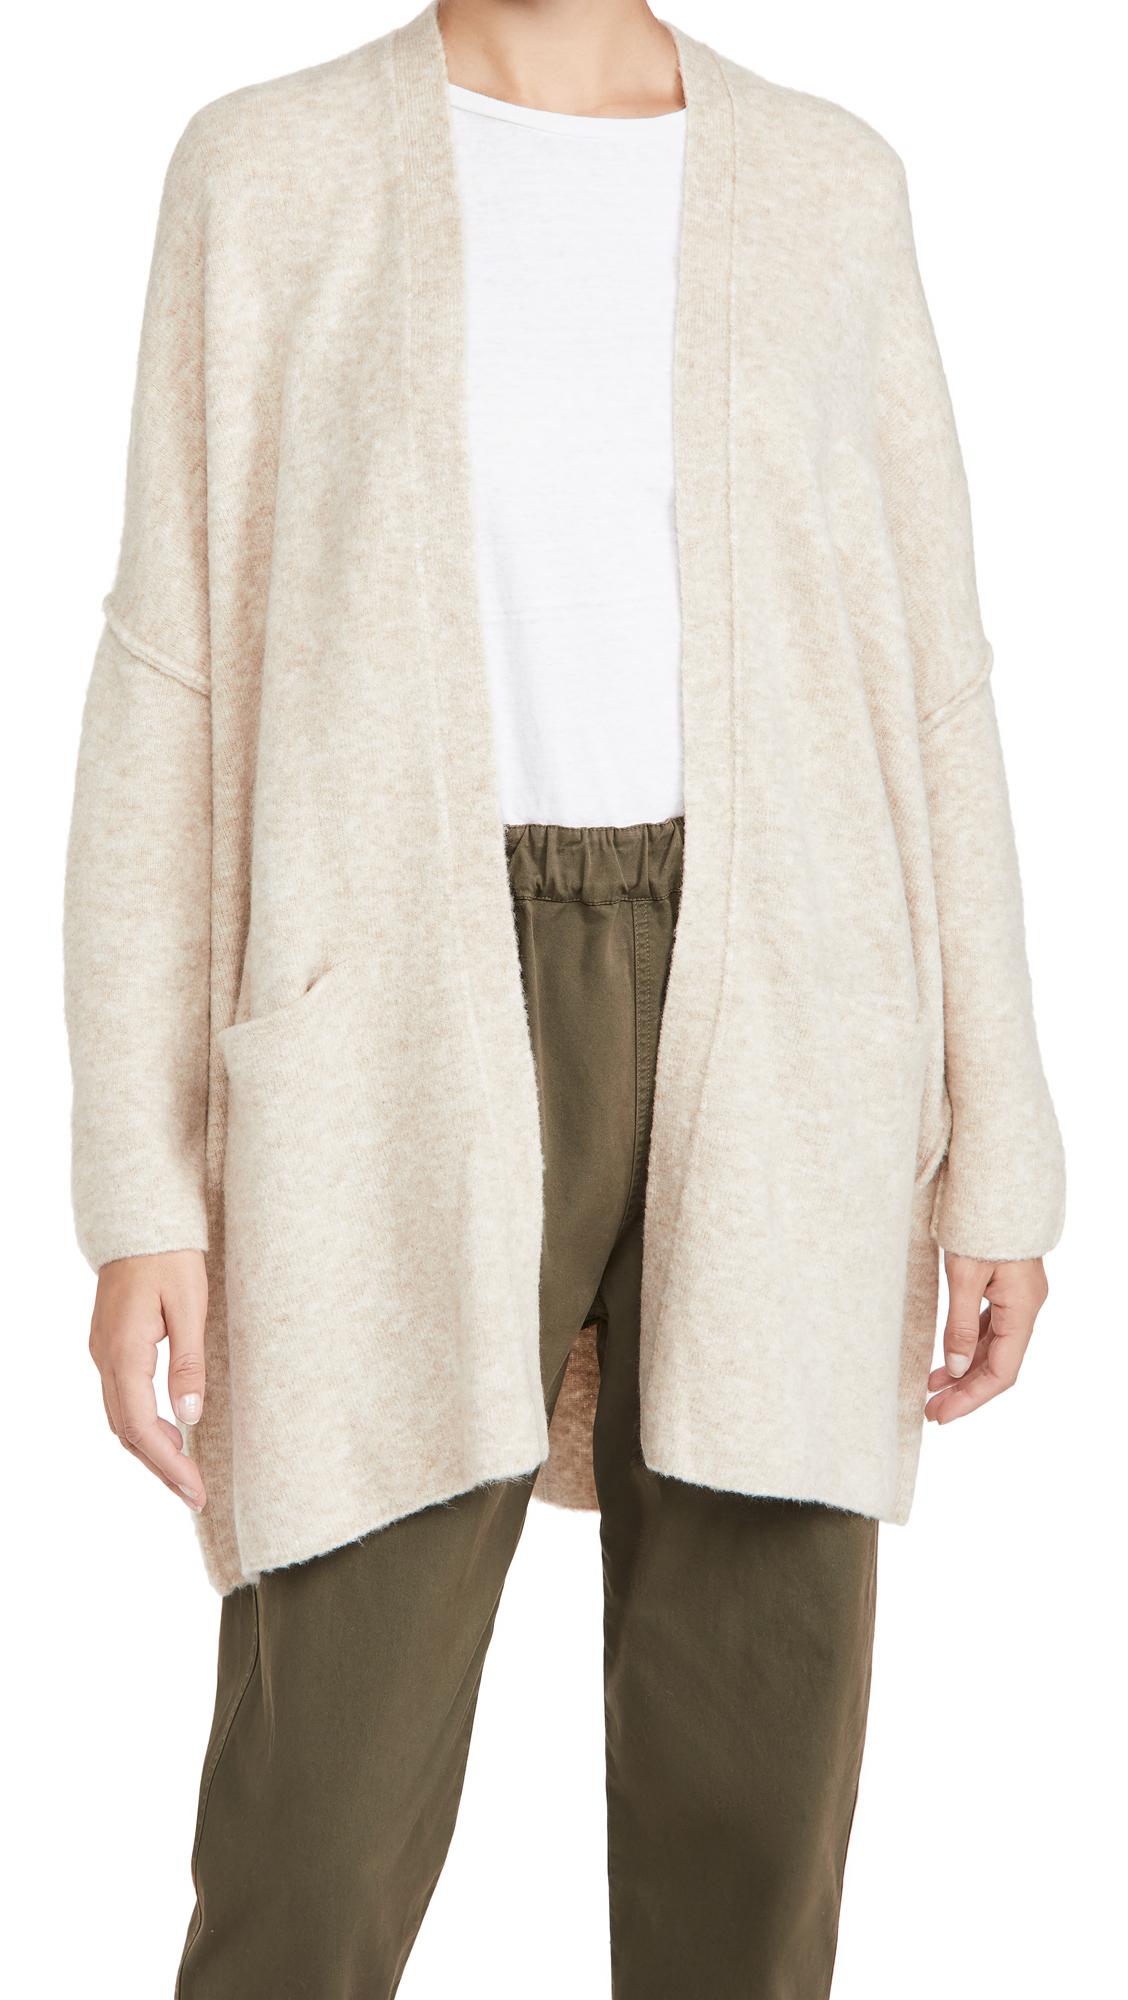 ATM Anthony Thomas Melillo Wool Blend Sweater Coat